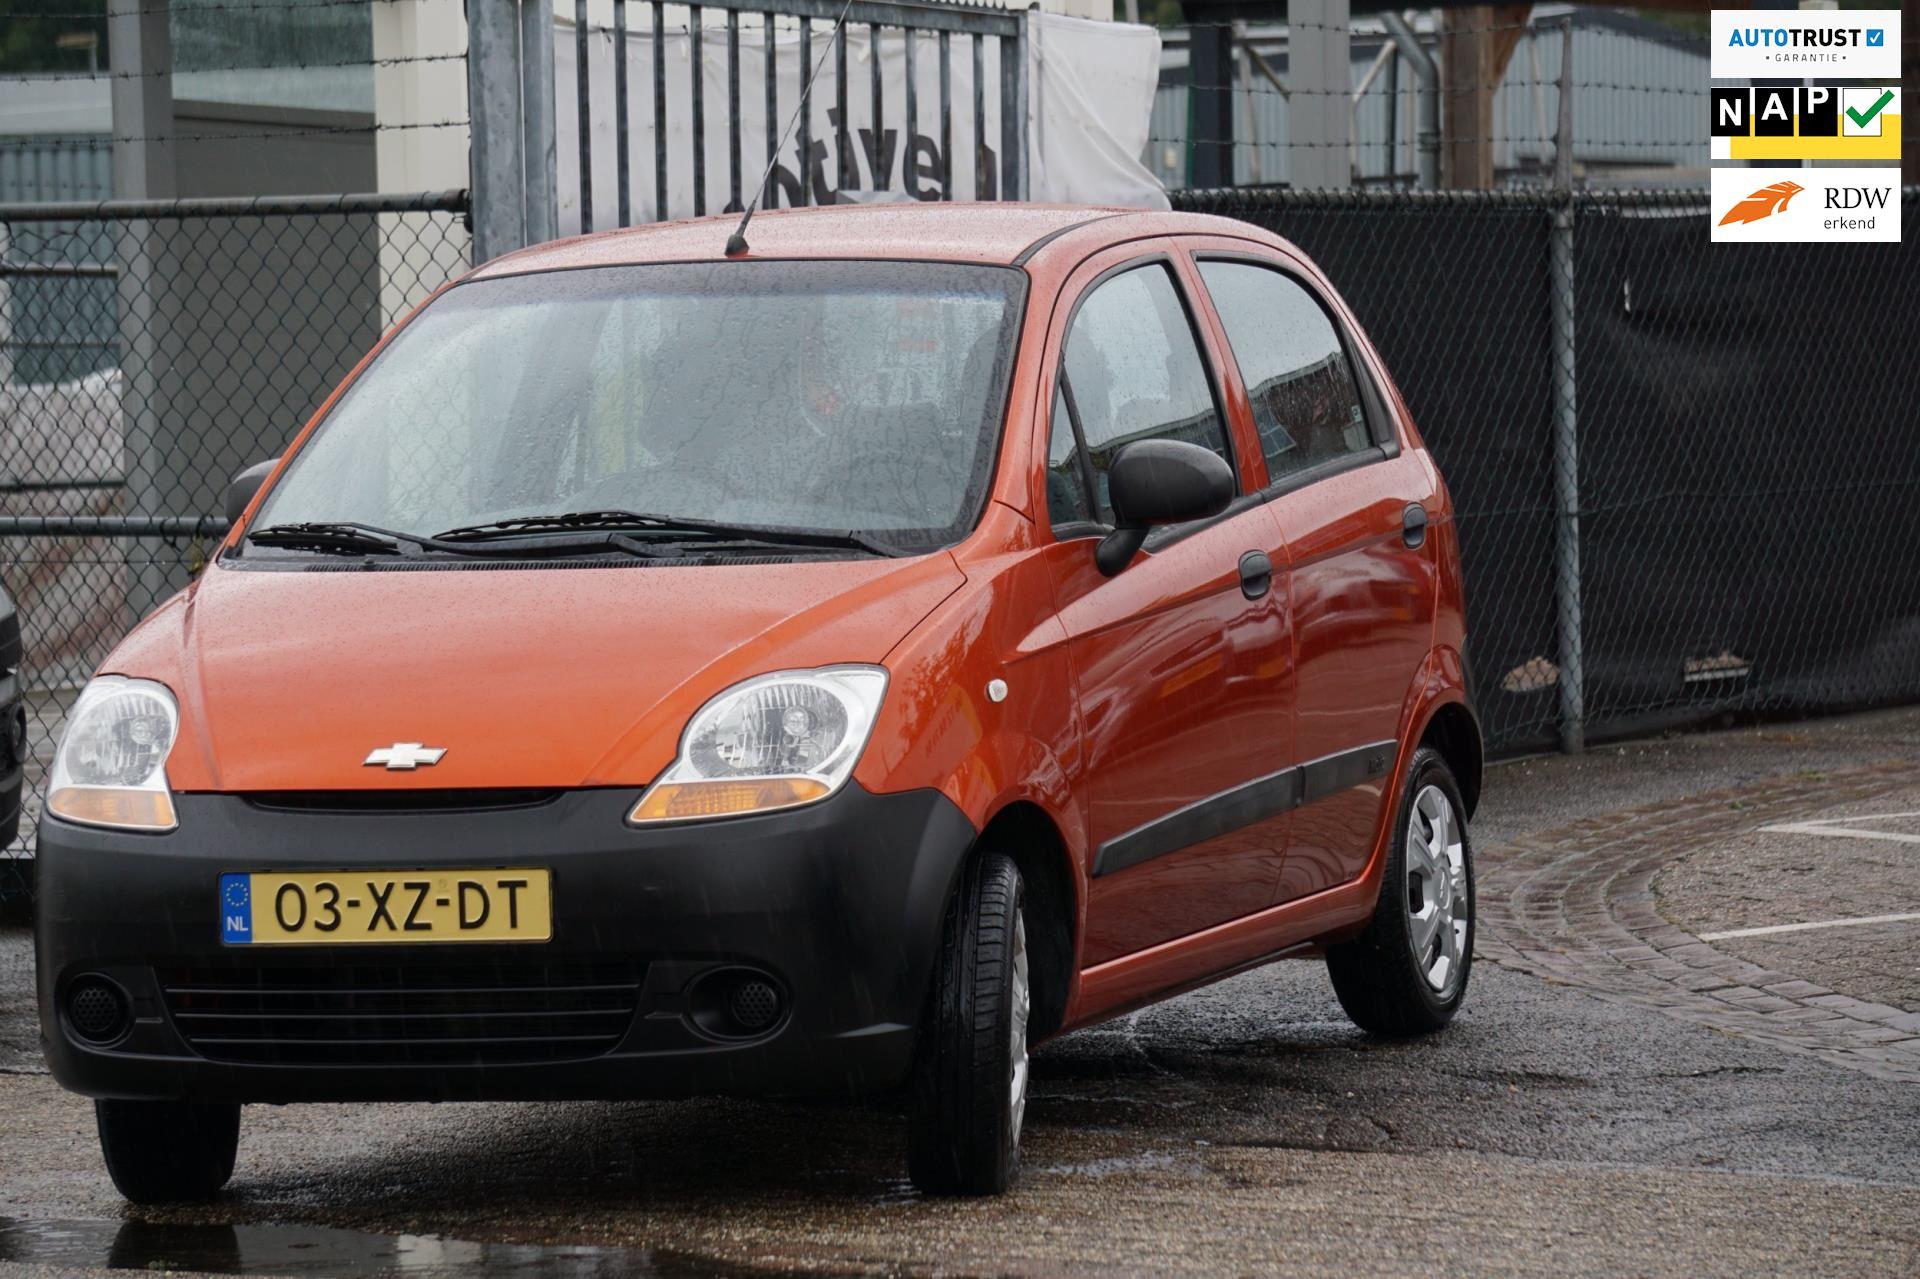 Chevrolet Matiz occasion - Automotive-Venray